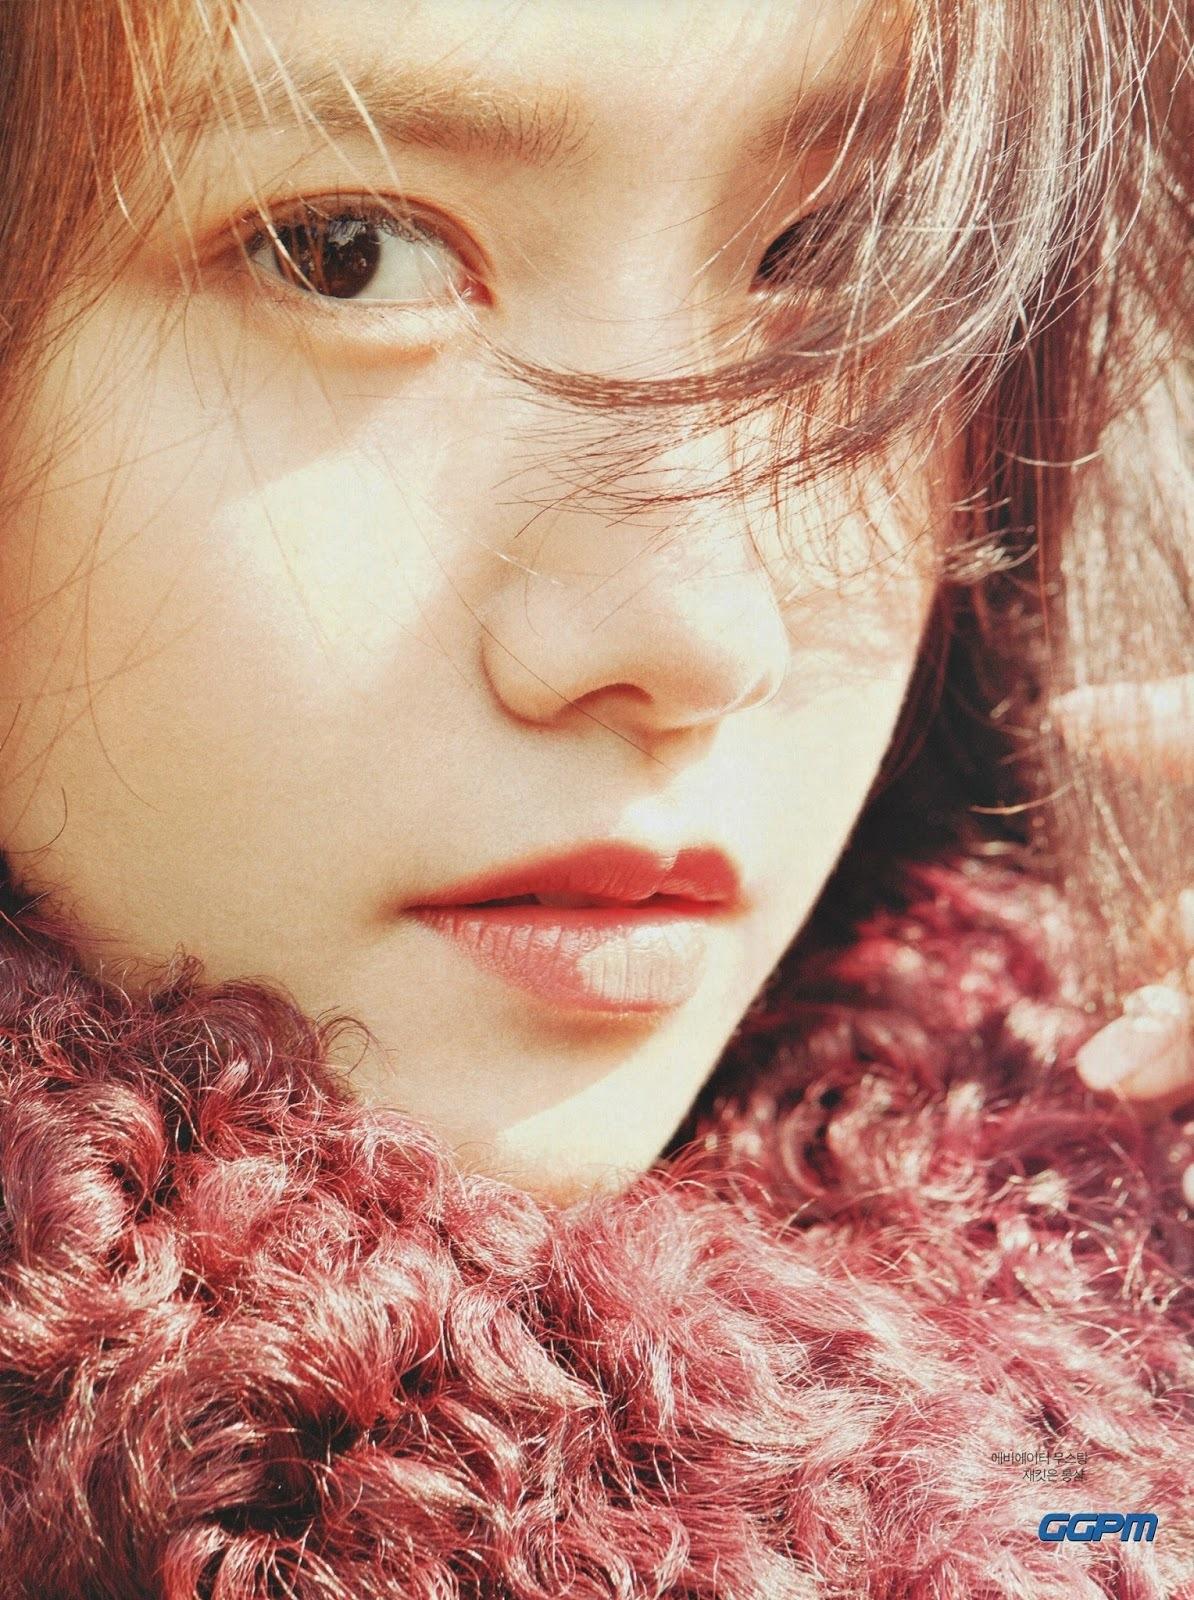 Yoona InStyle November.2017 [GGPM]-Scan006O.jpg